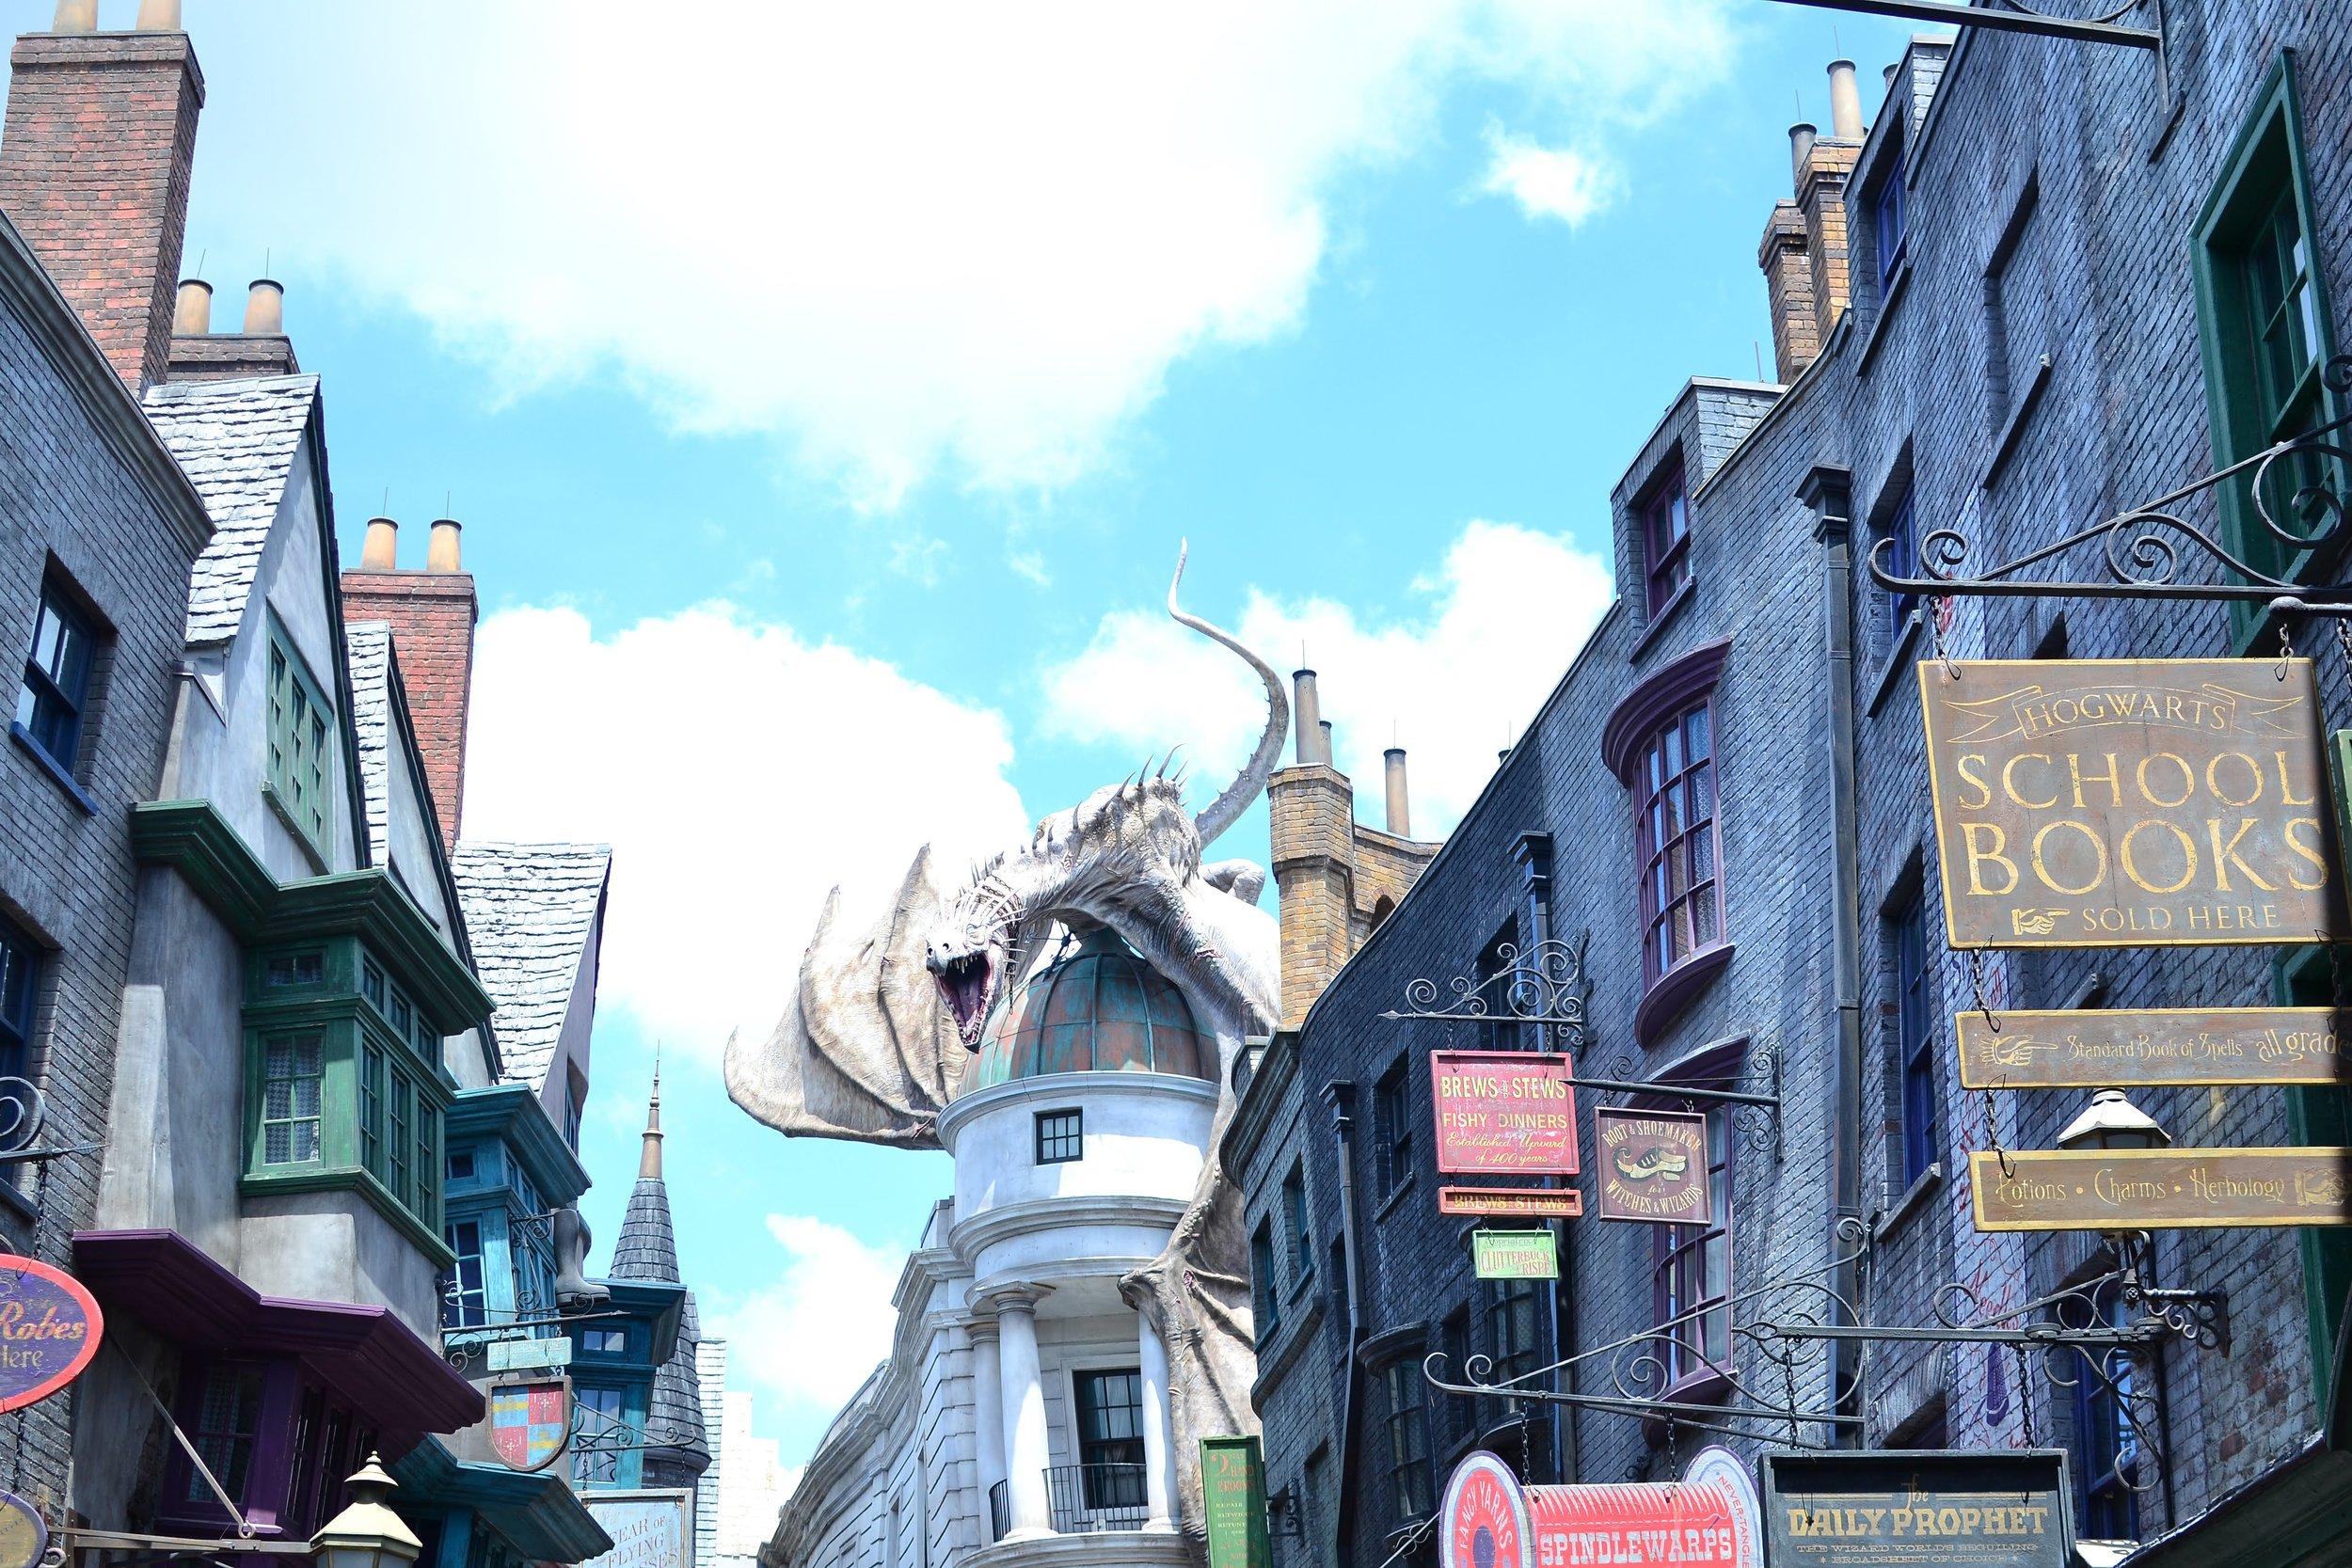 Wizarding World of Harry Potter at Universal Orlando